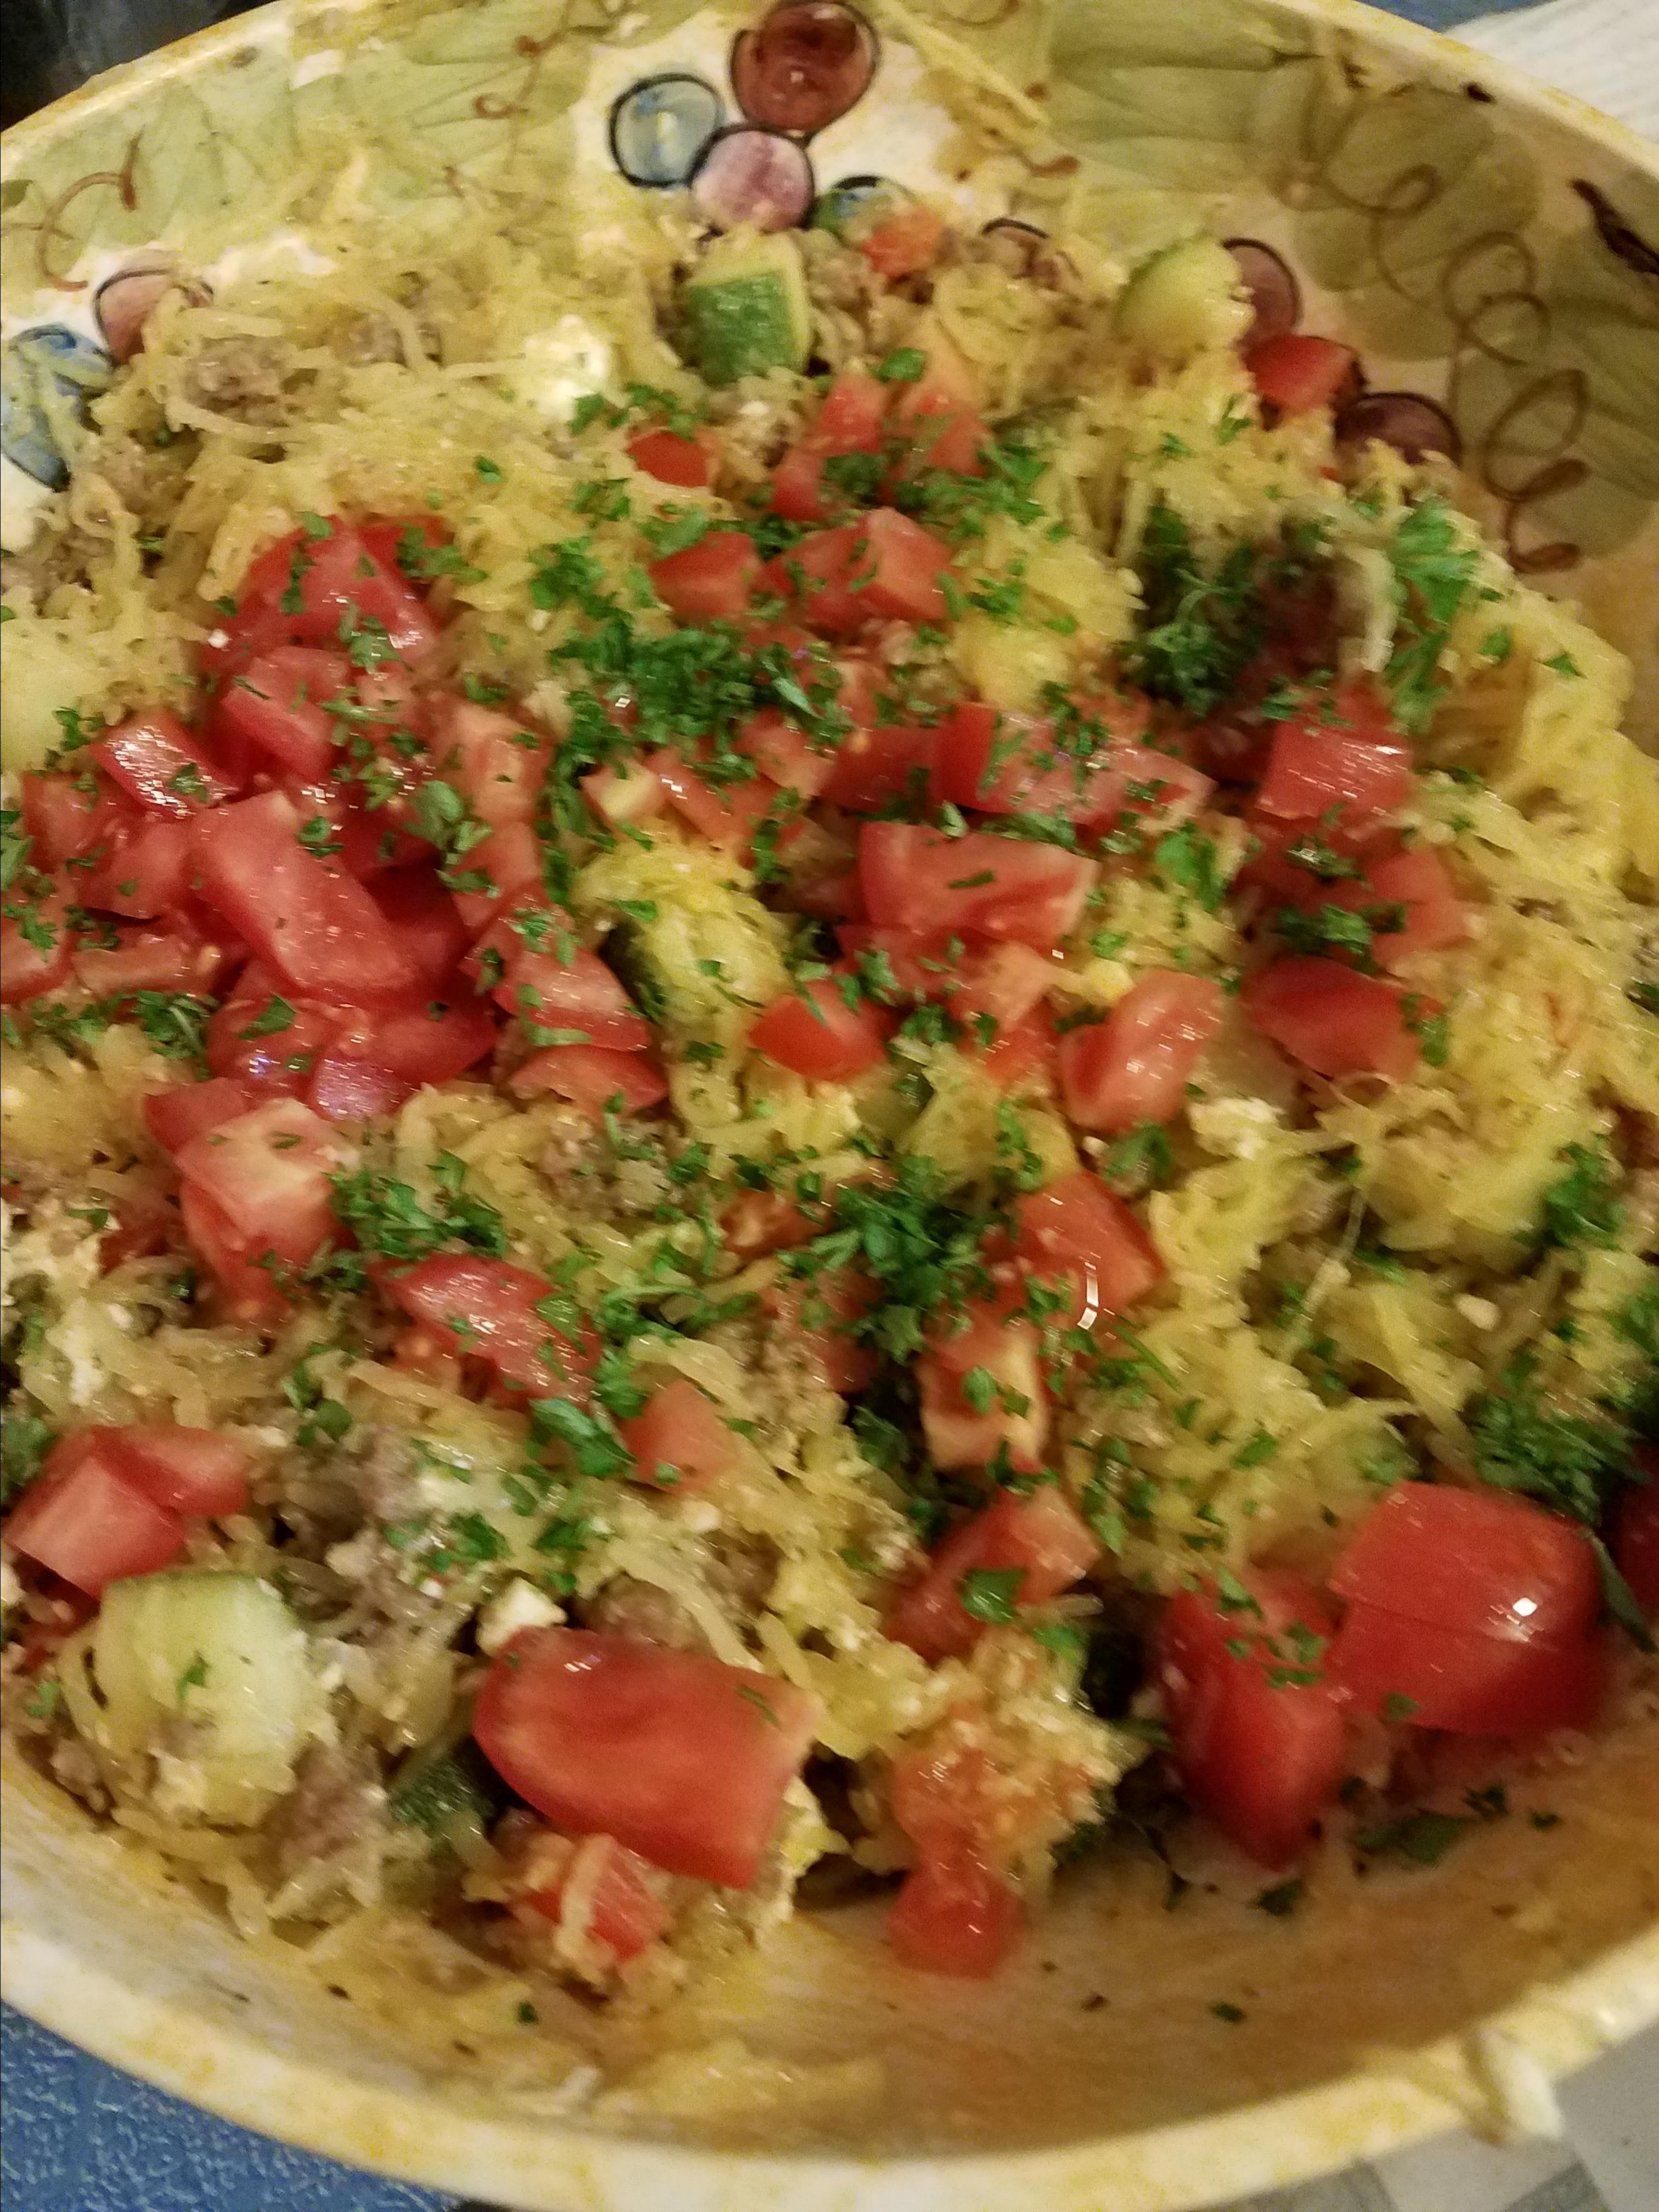 Spaghetti Squash Mediterranean-Style